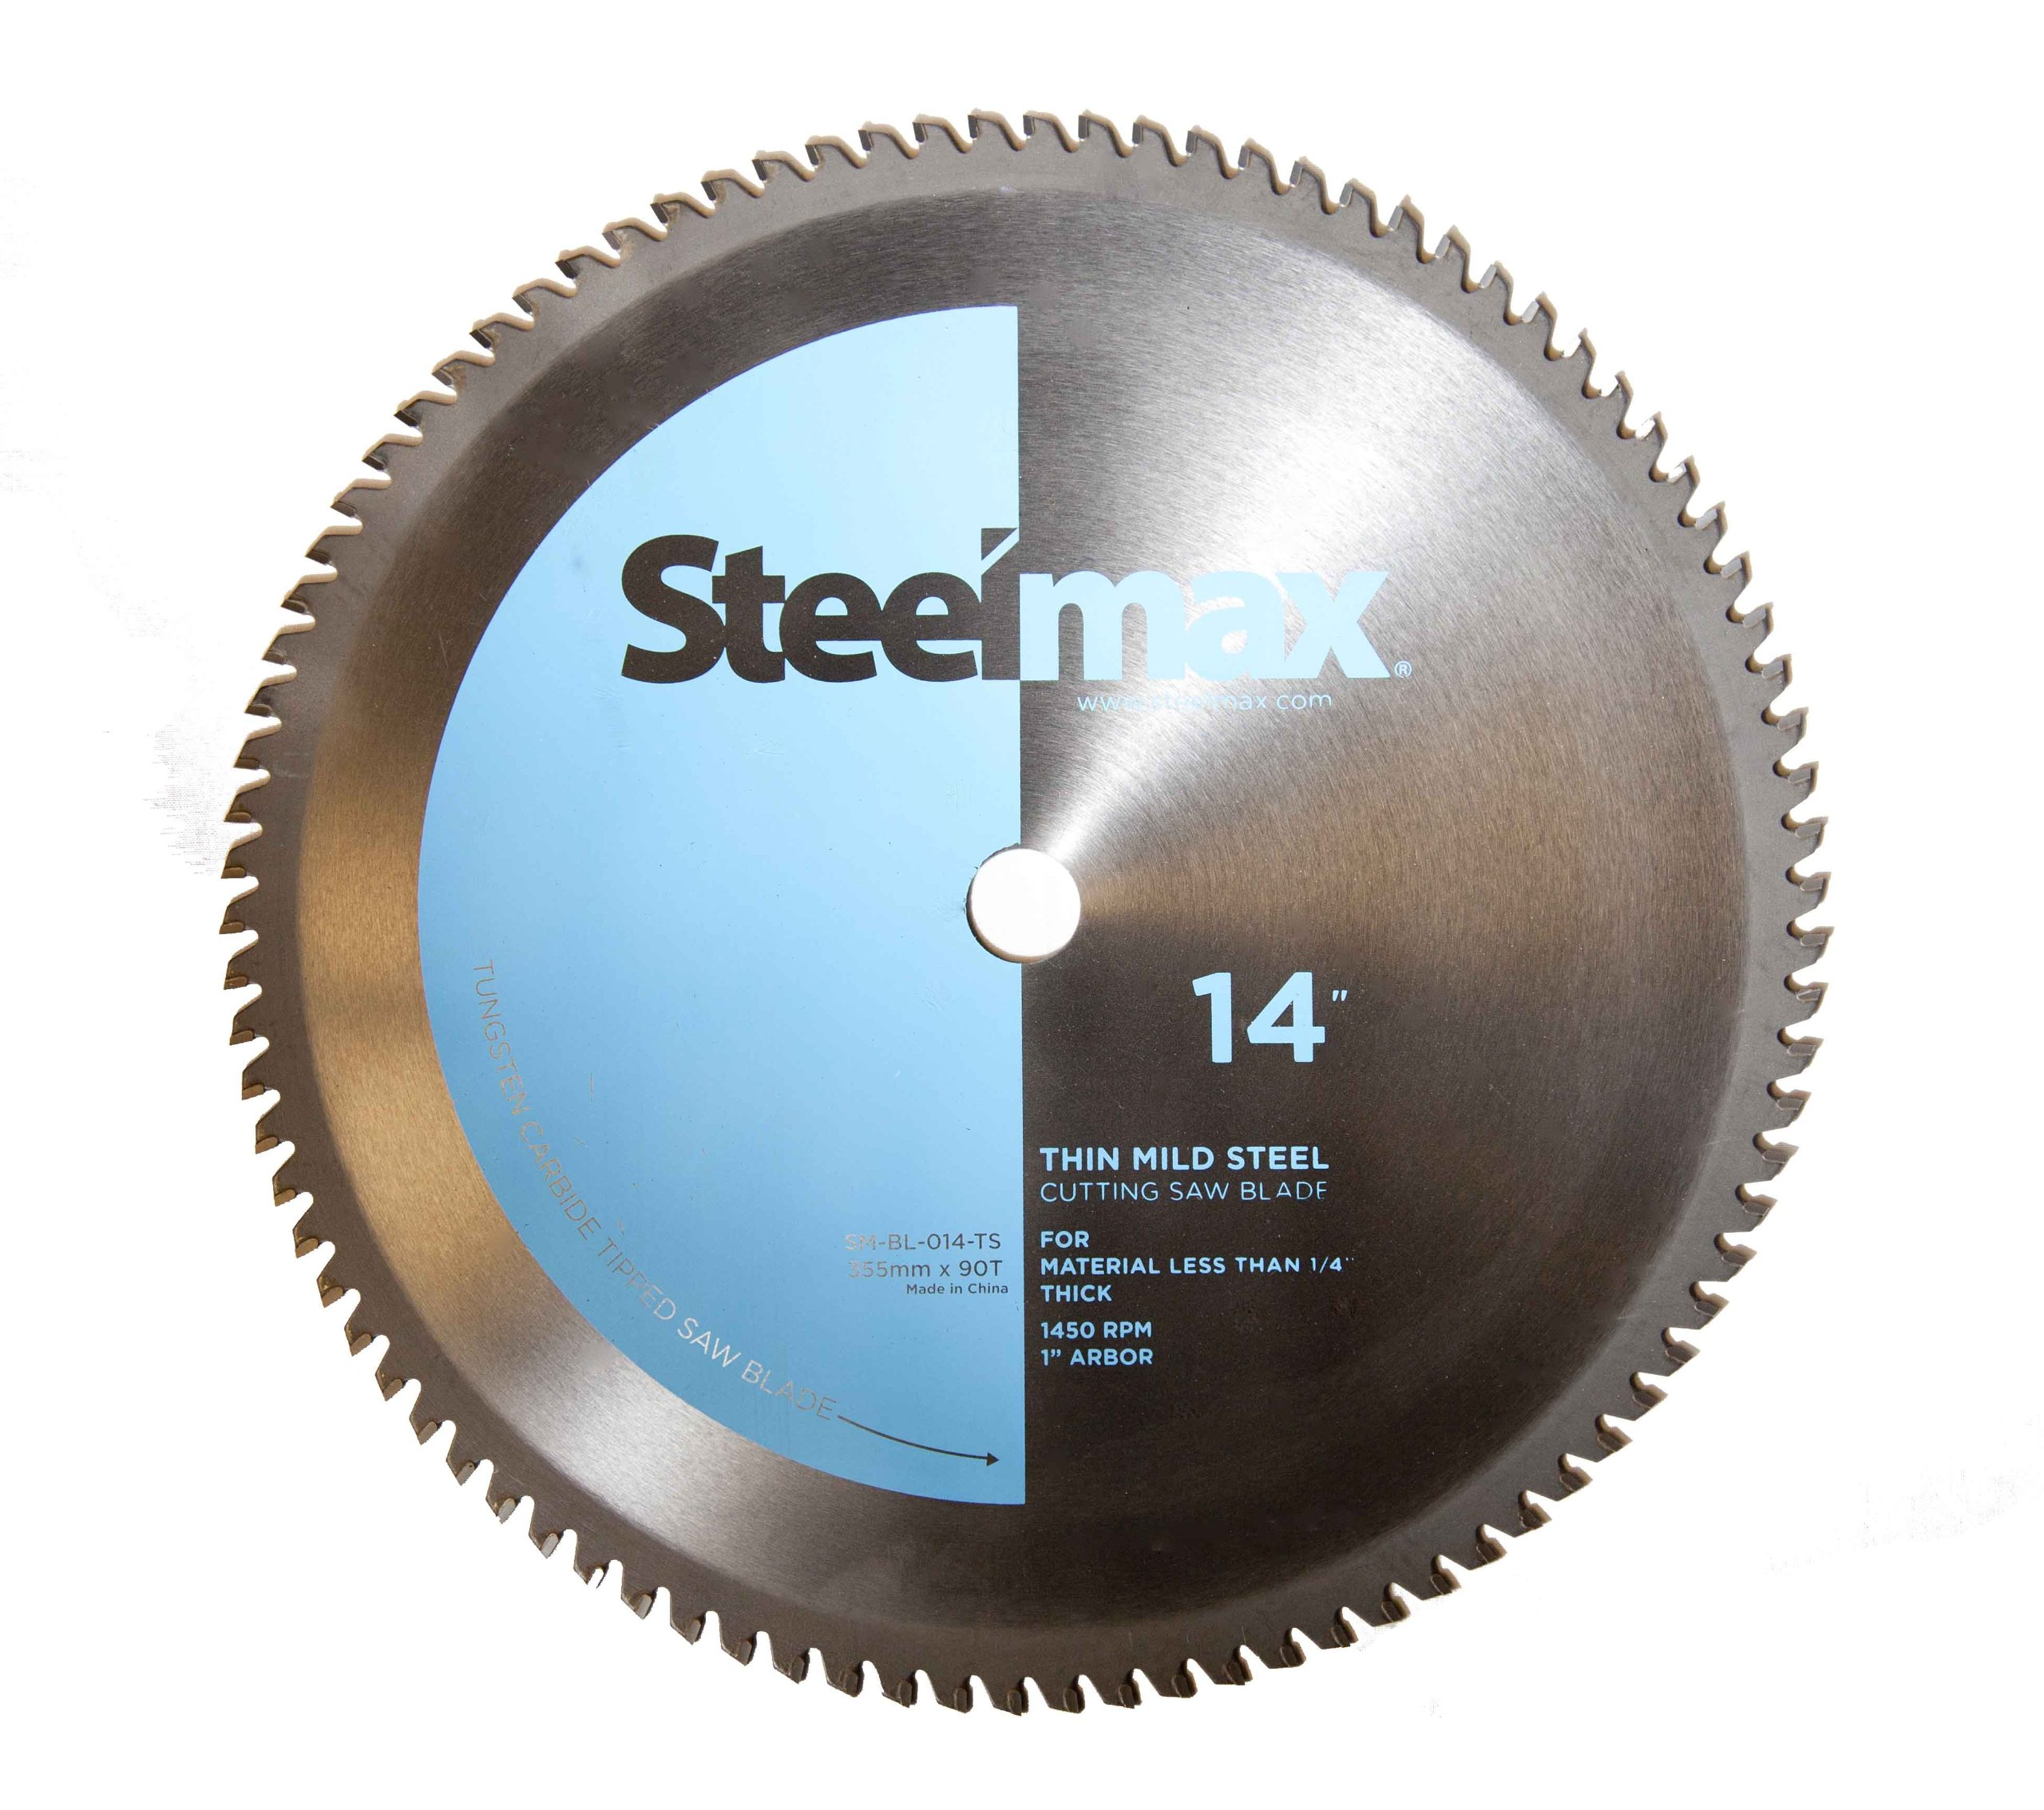 Steelmax 14'' TCT Blade for Thin Steel